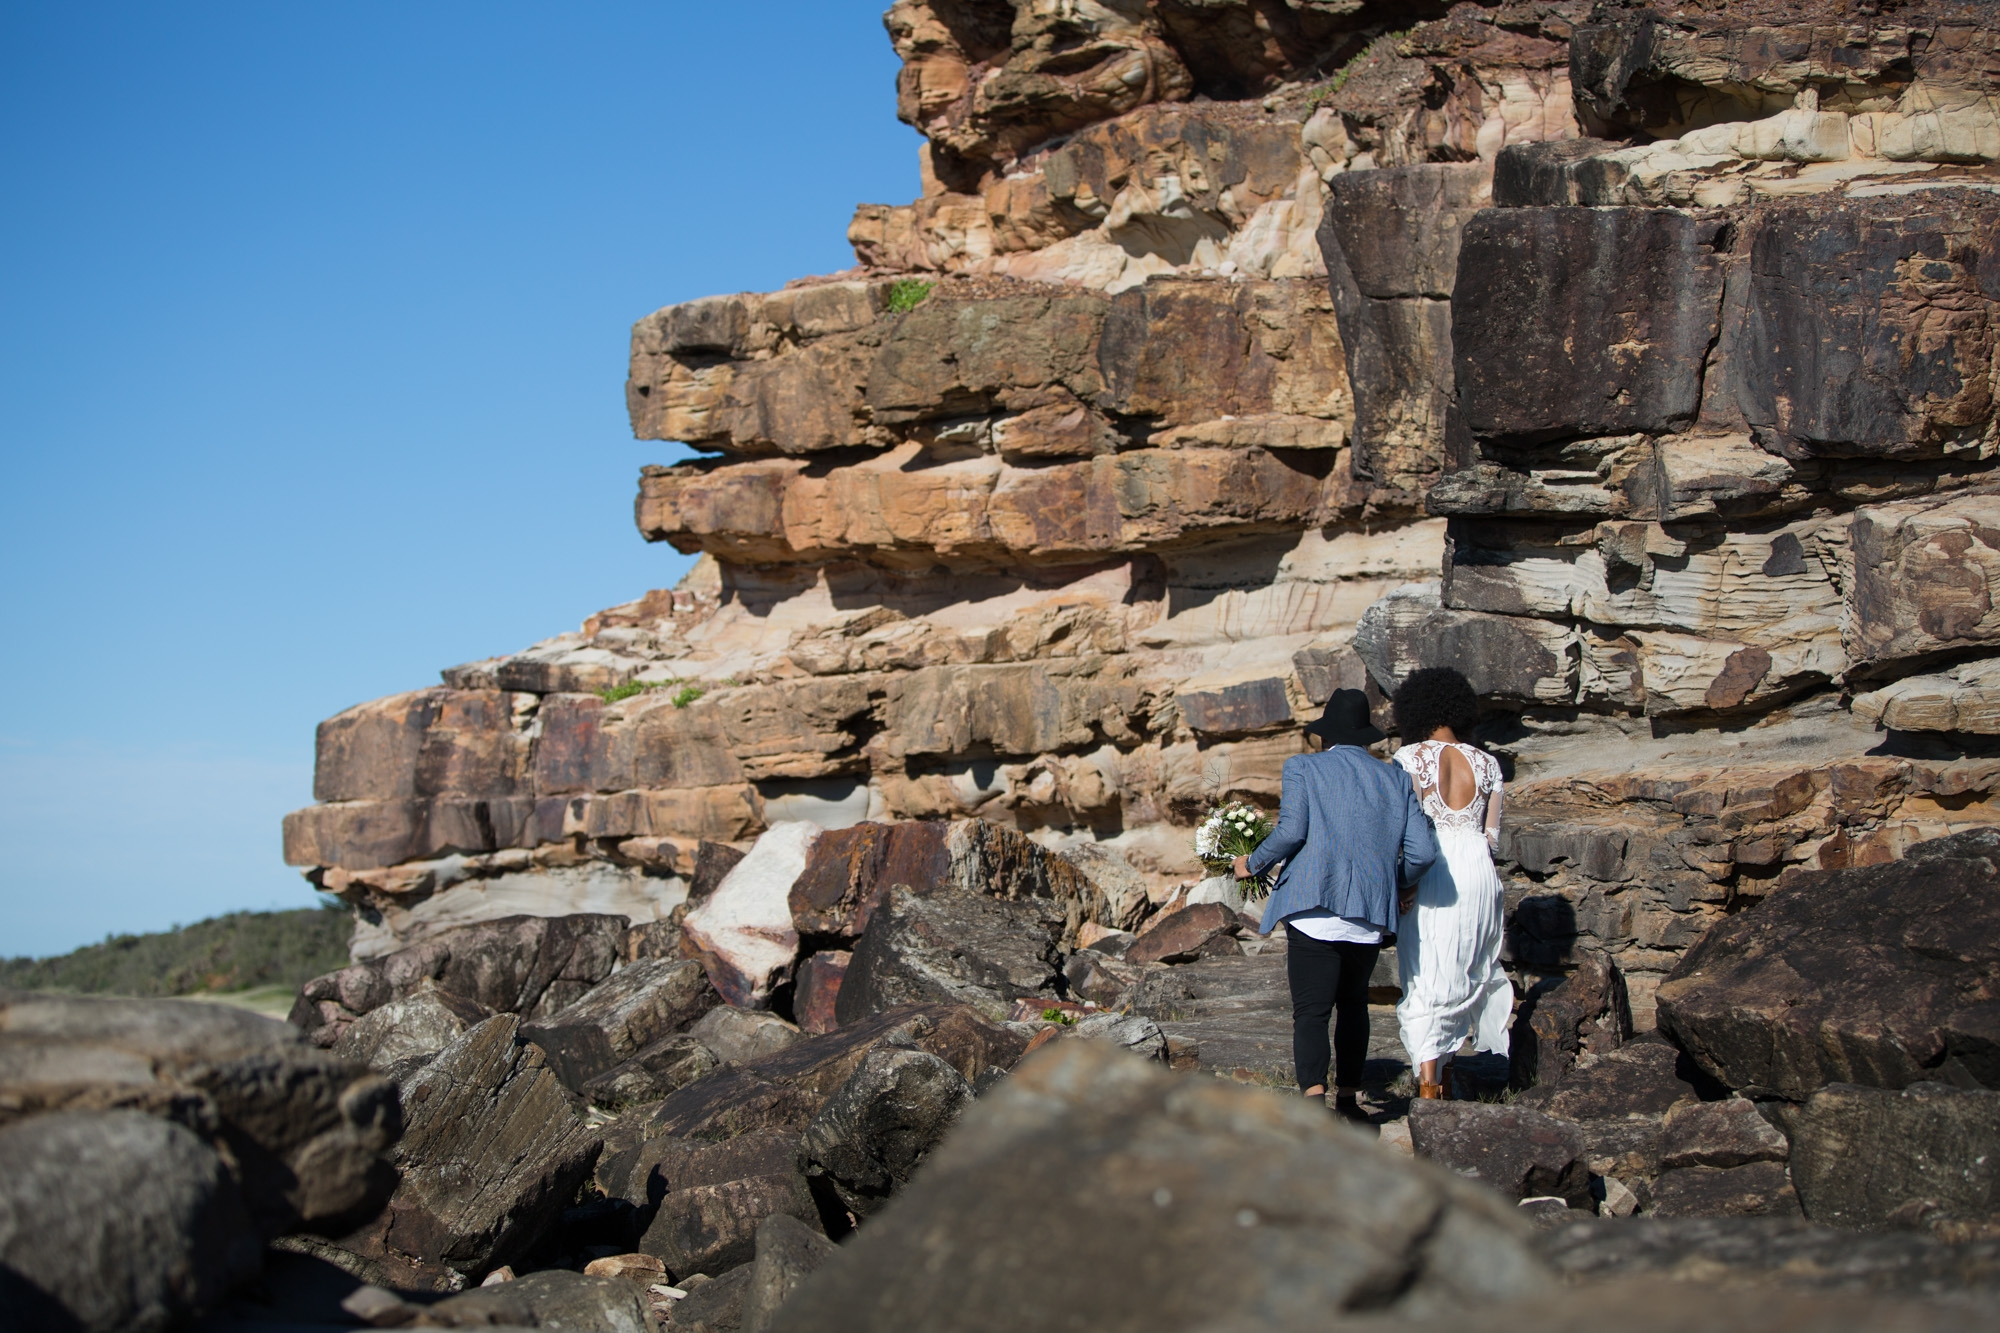 Bride and groom walking across the rocks from behind